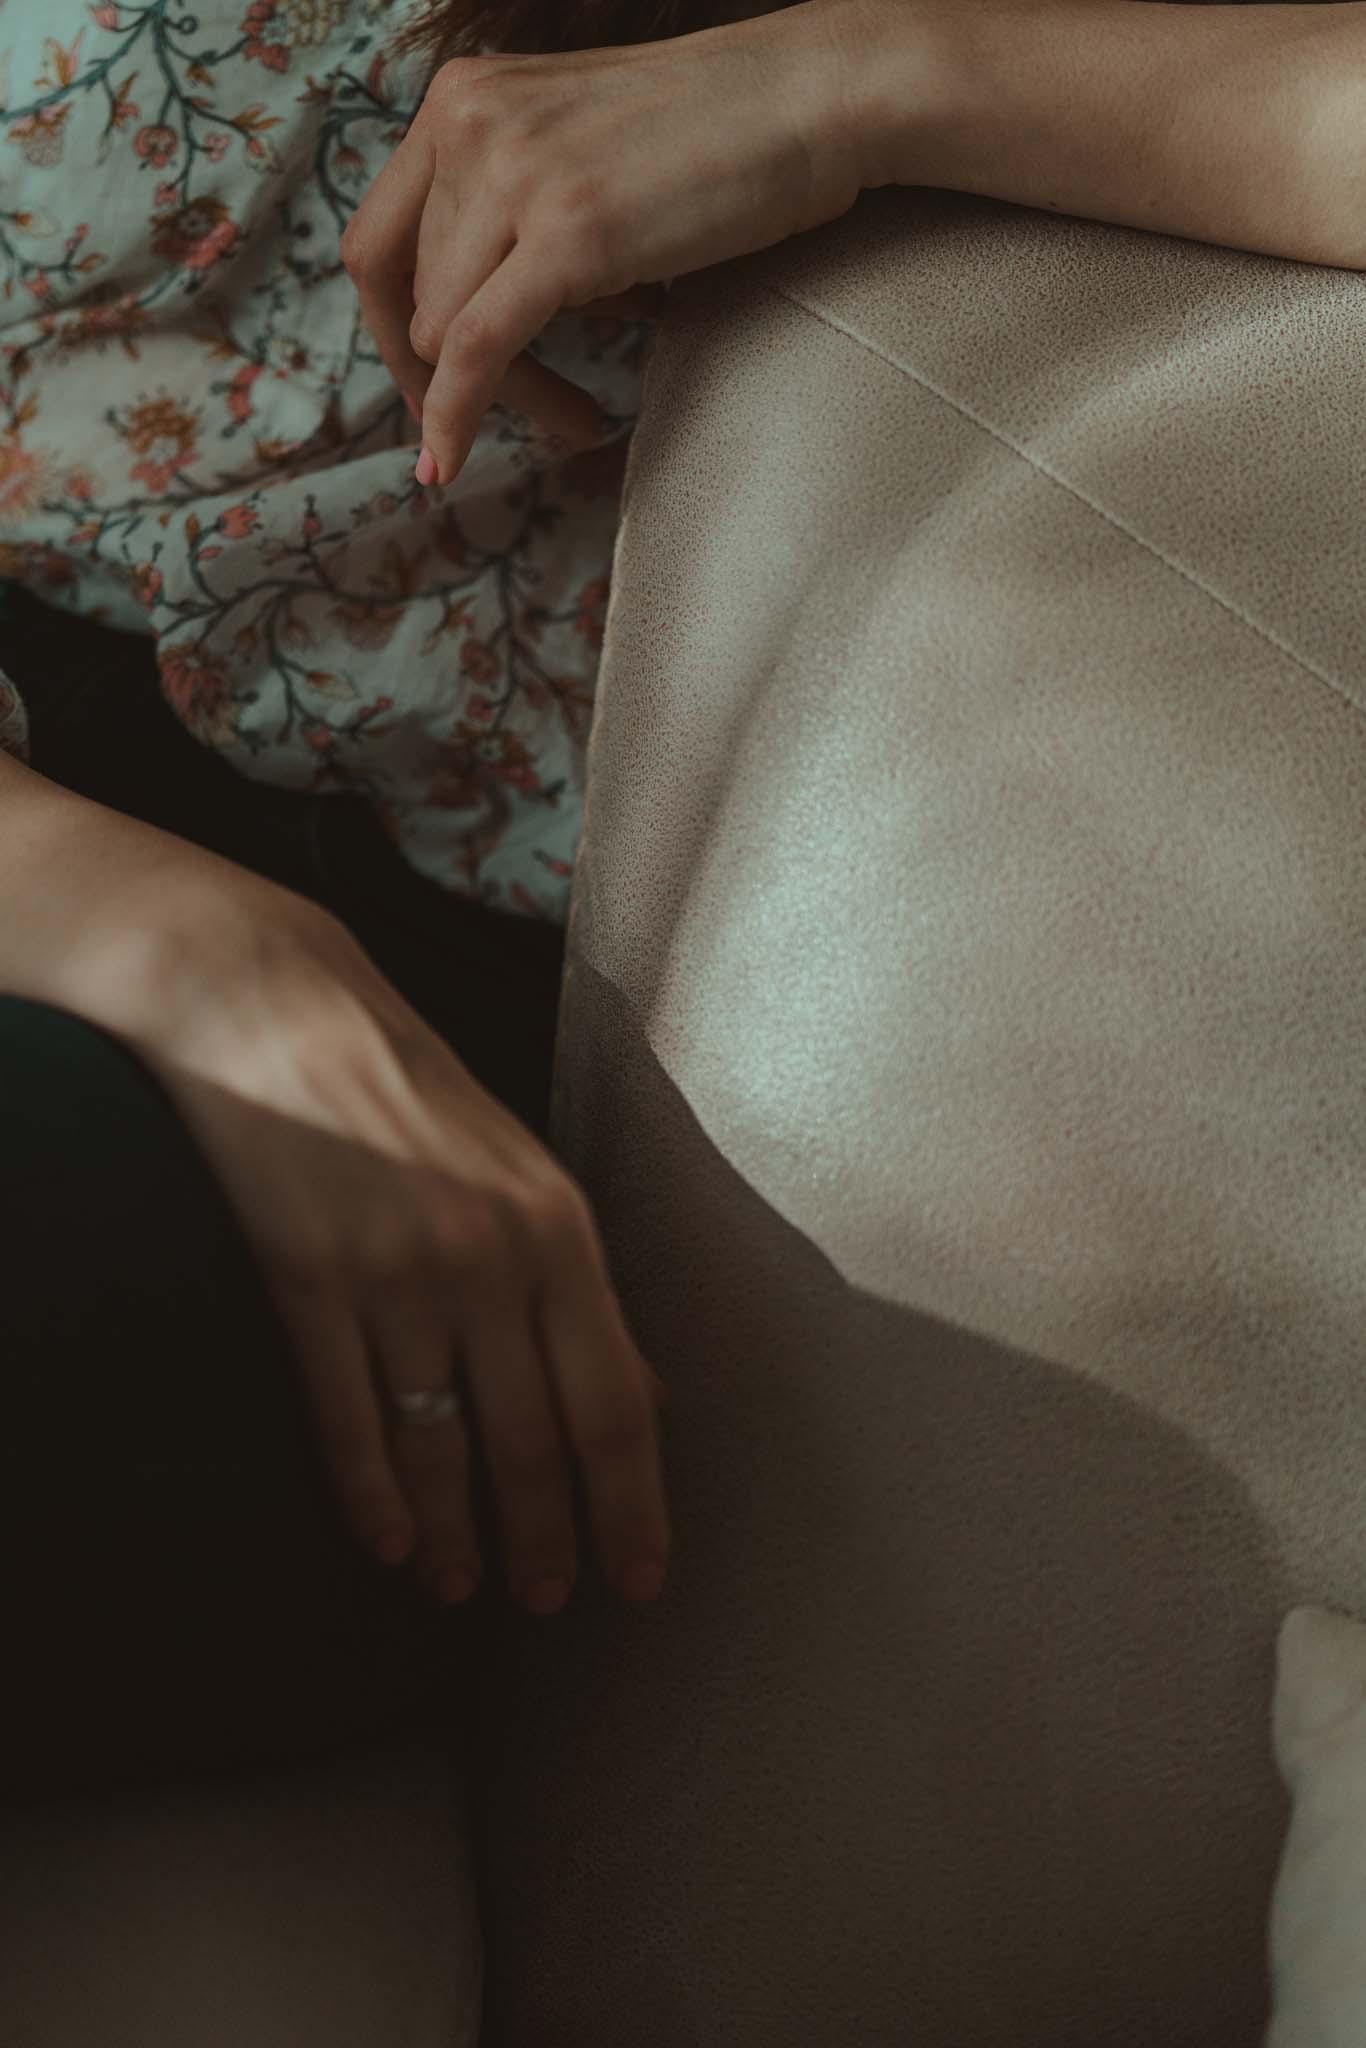 Bulgaria, Bulgaria photographer, day in life, photographer bulgaria, Sofia, Sofia family photographer, детска фотосесия, детски снимки, детски фотограф, семеен фотограф, семейни снимки, фотограф, фотограф Варна, фотограф София, фотография, фотосесия